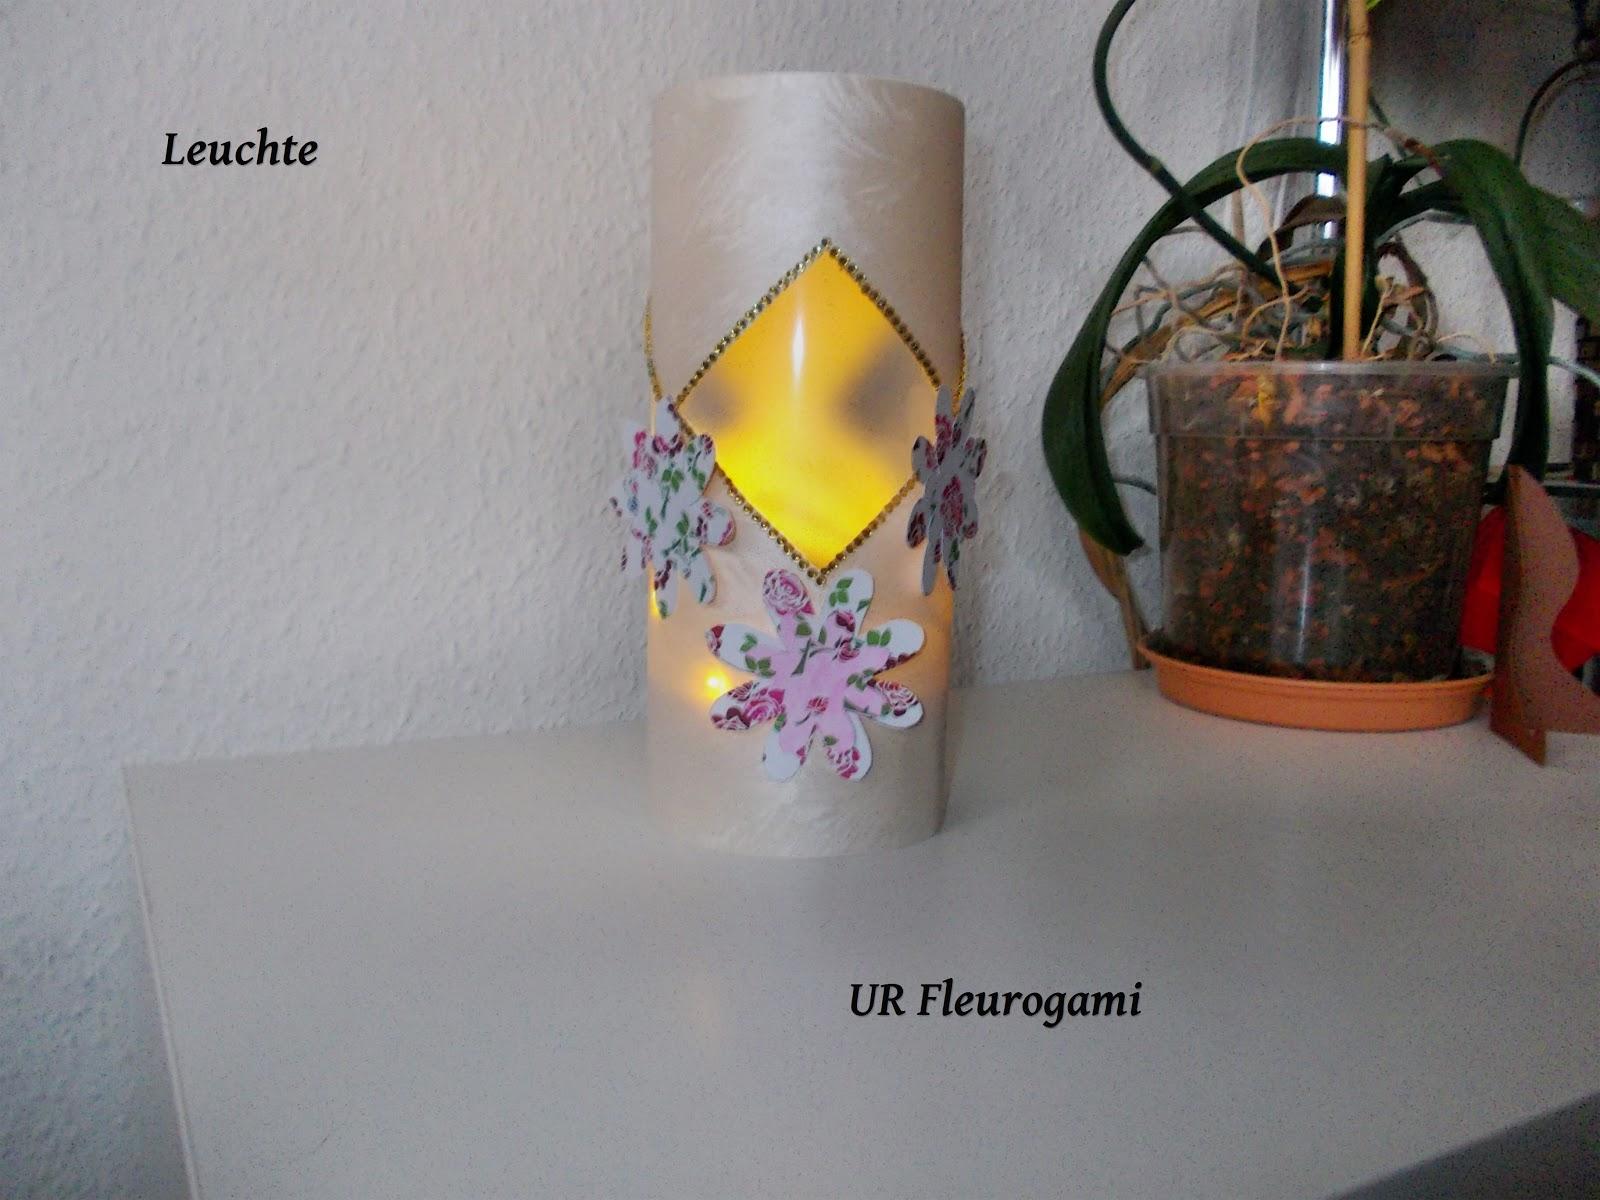 origami fleurogami und sterne my leuchte by ur fleurogami. Black Bedroom Furniture Sets. Home Design Ideas